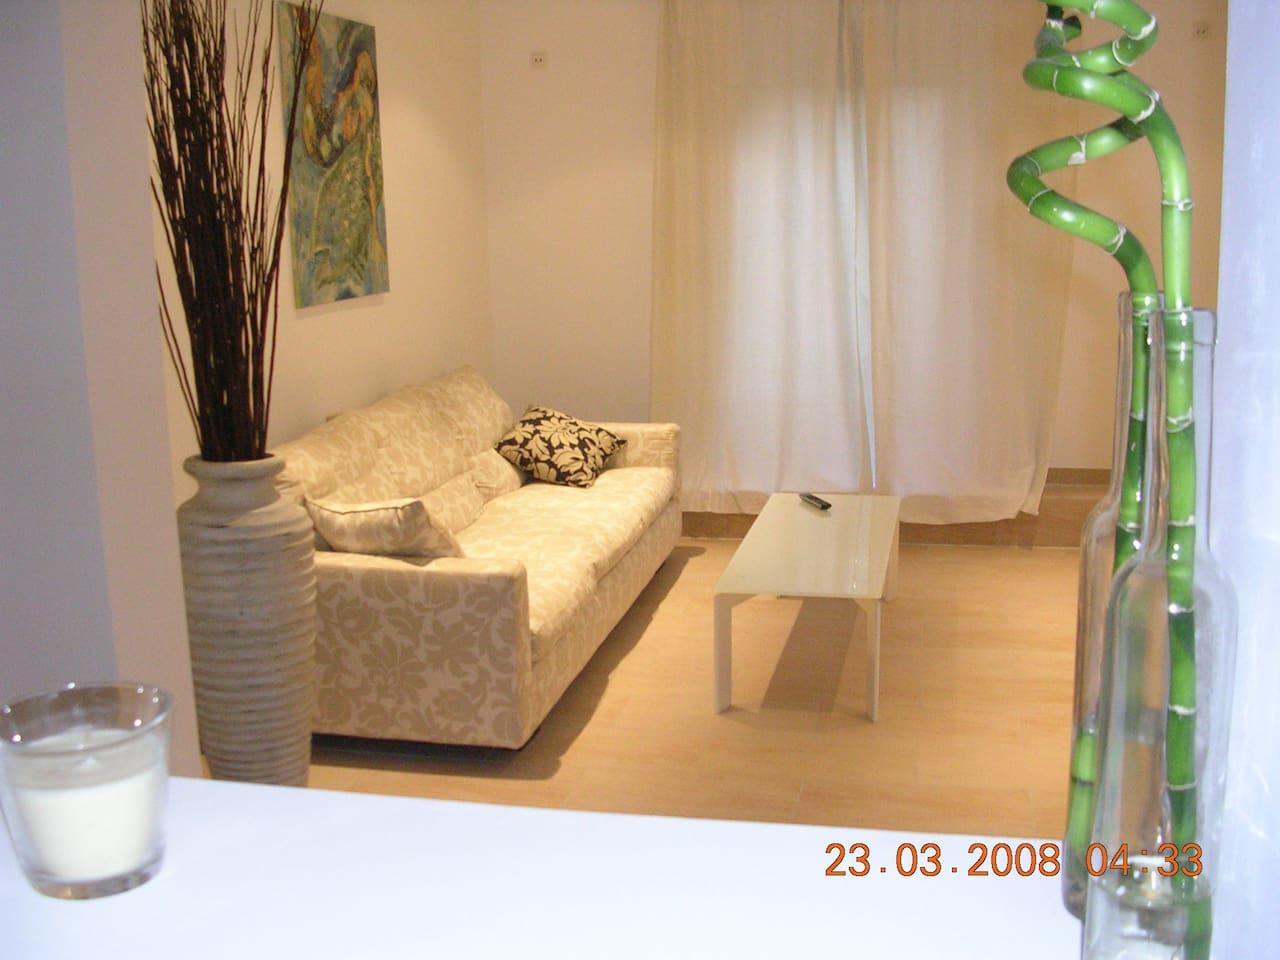 Stylish apartment in Eimsbüttel